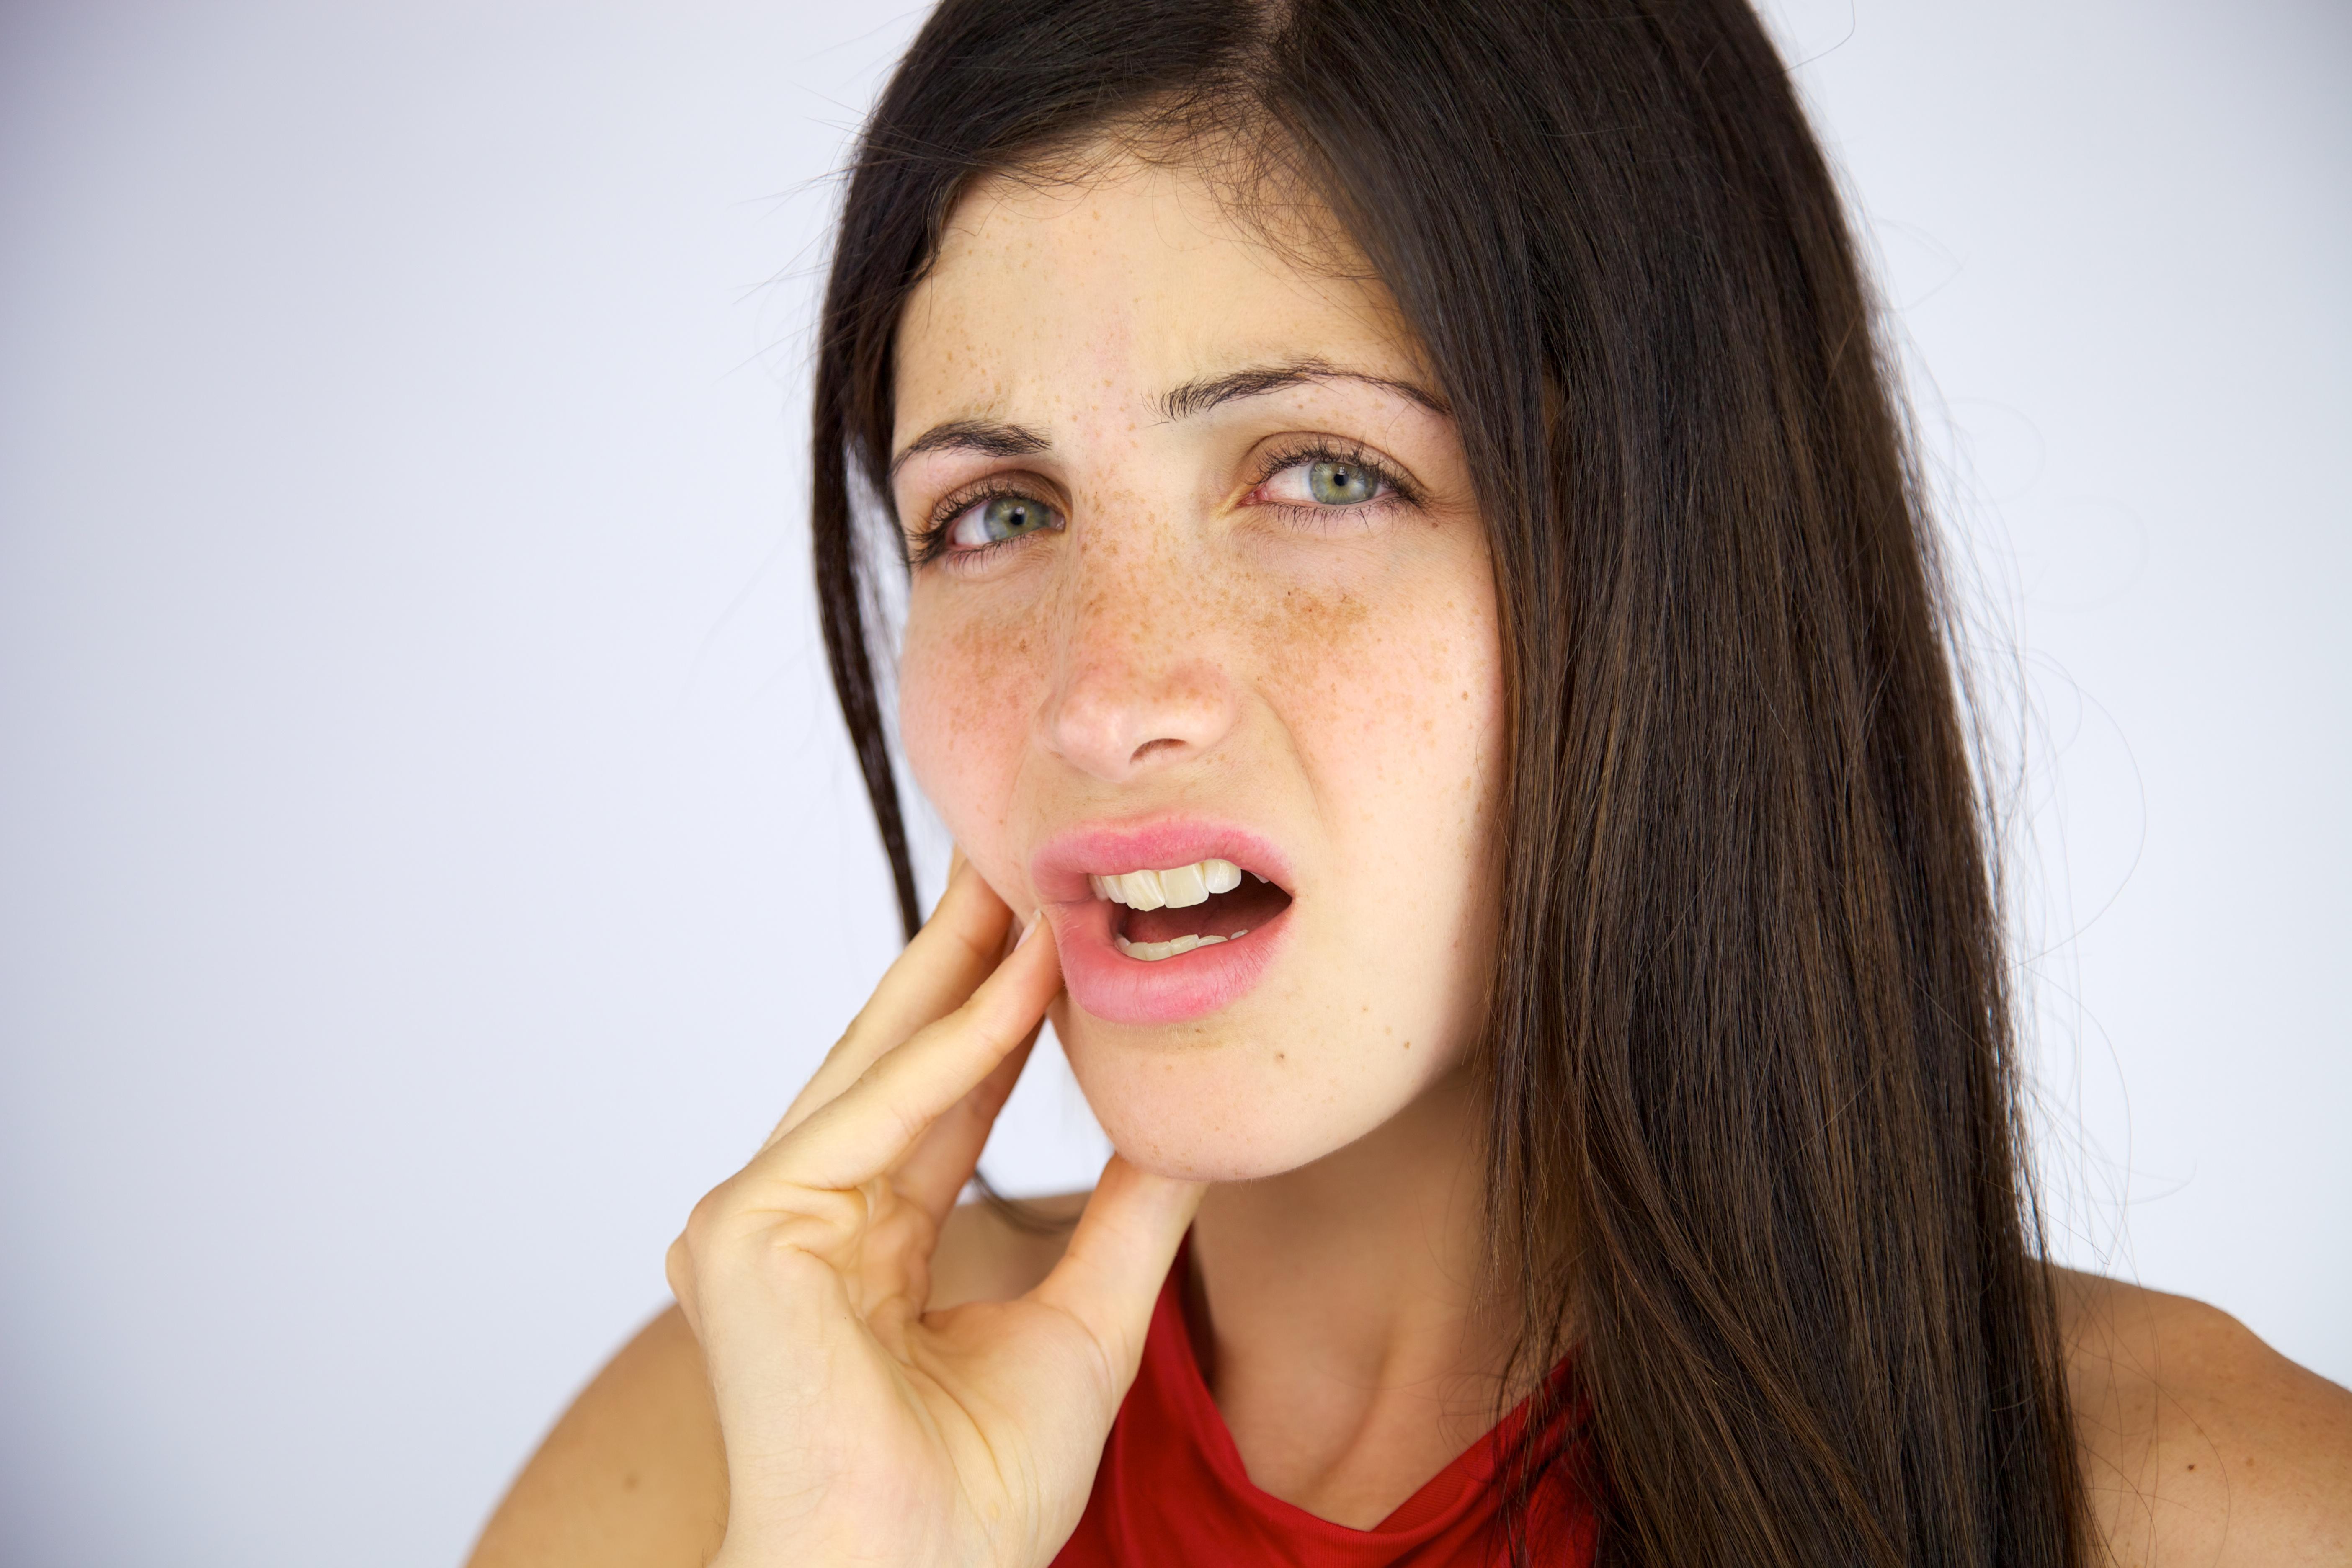 emergency dental care 21202